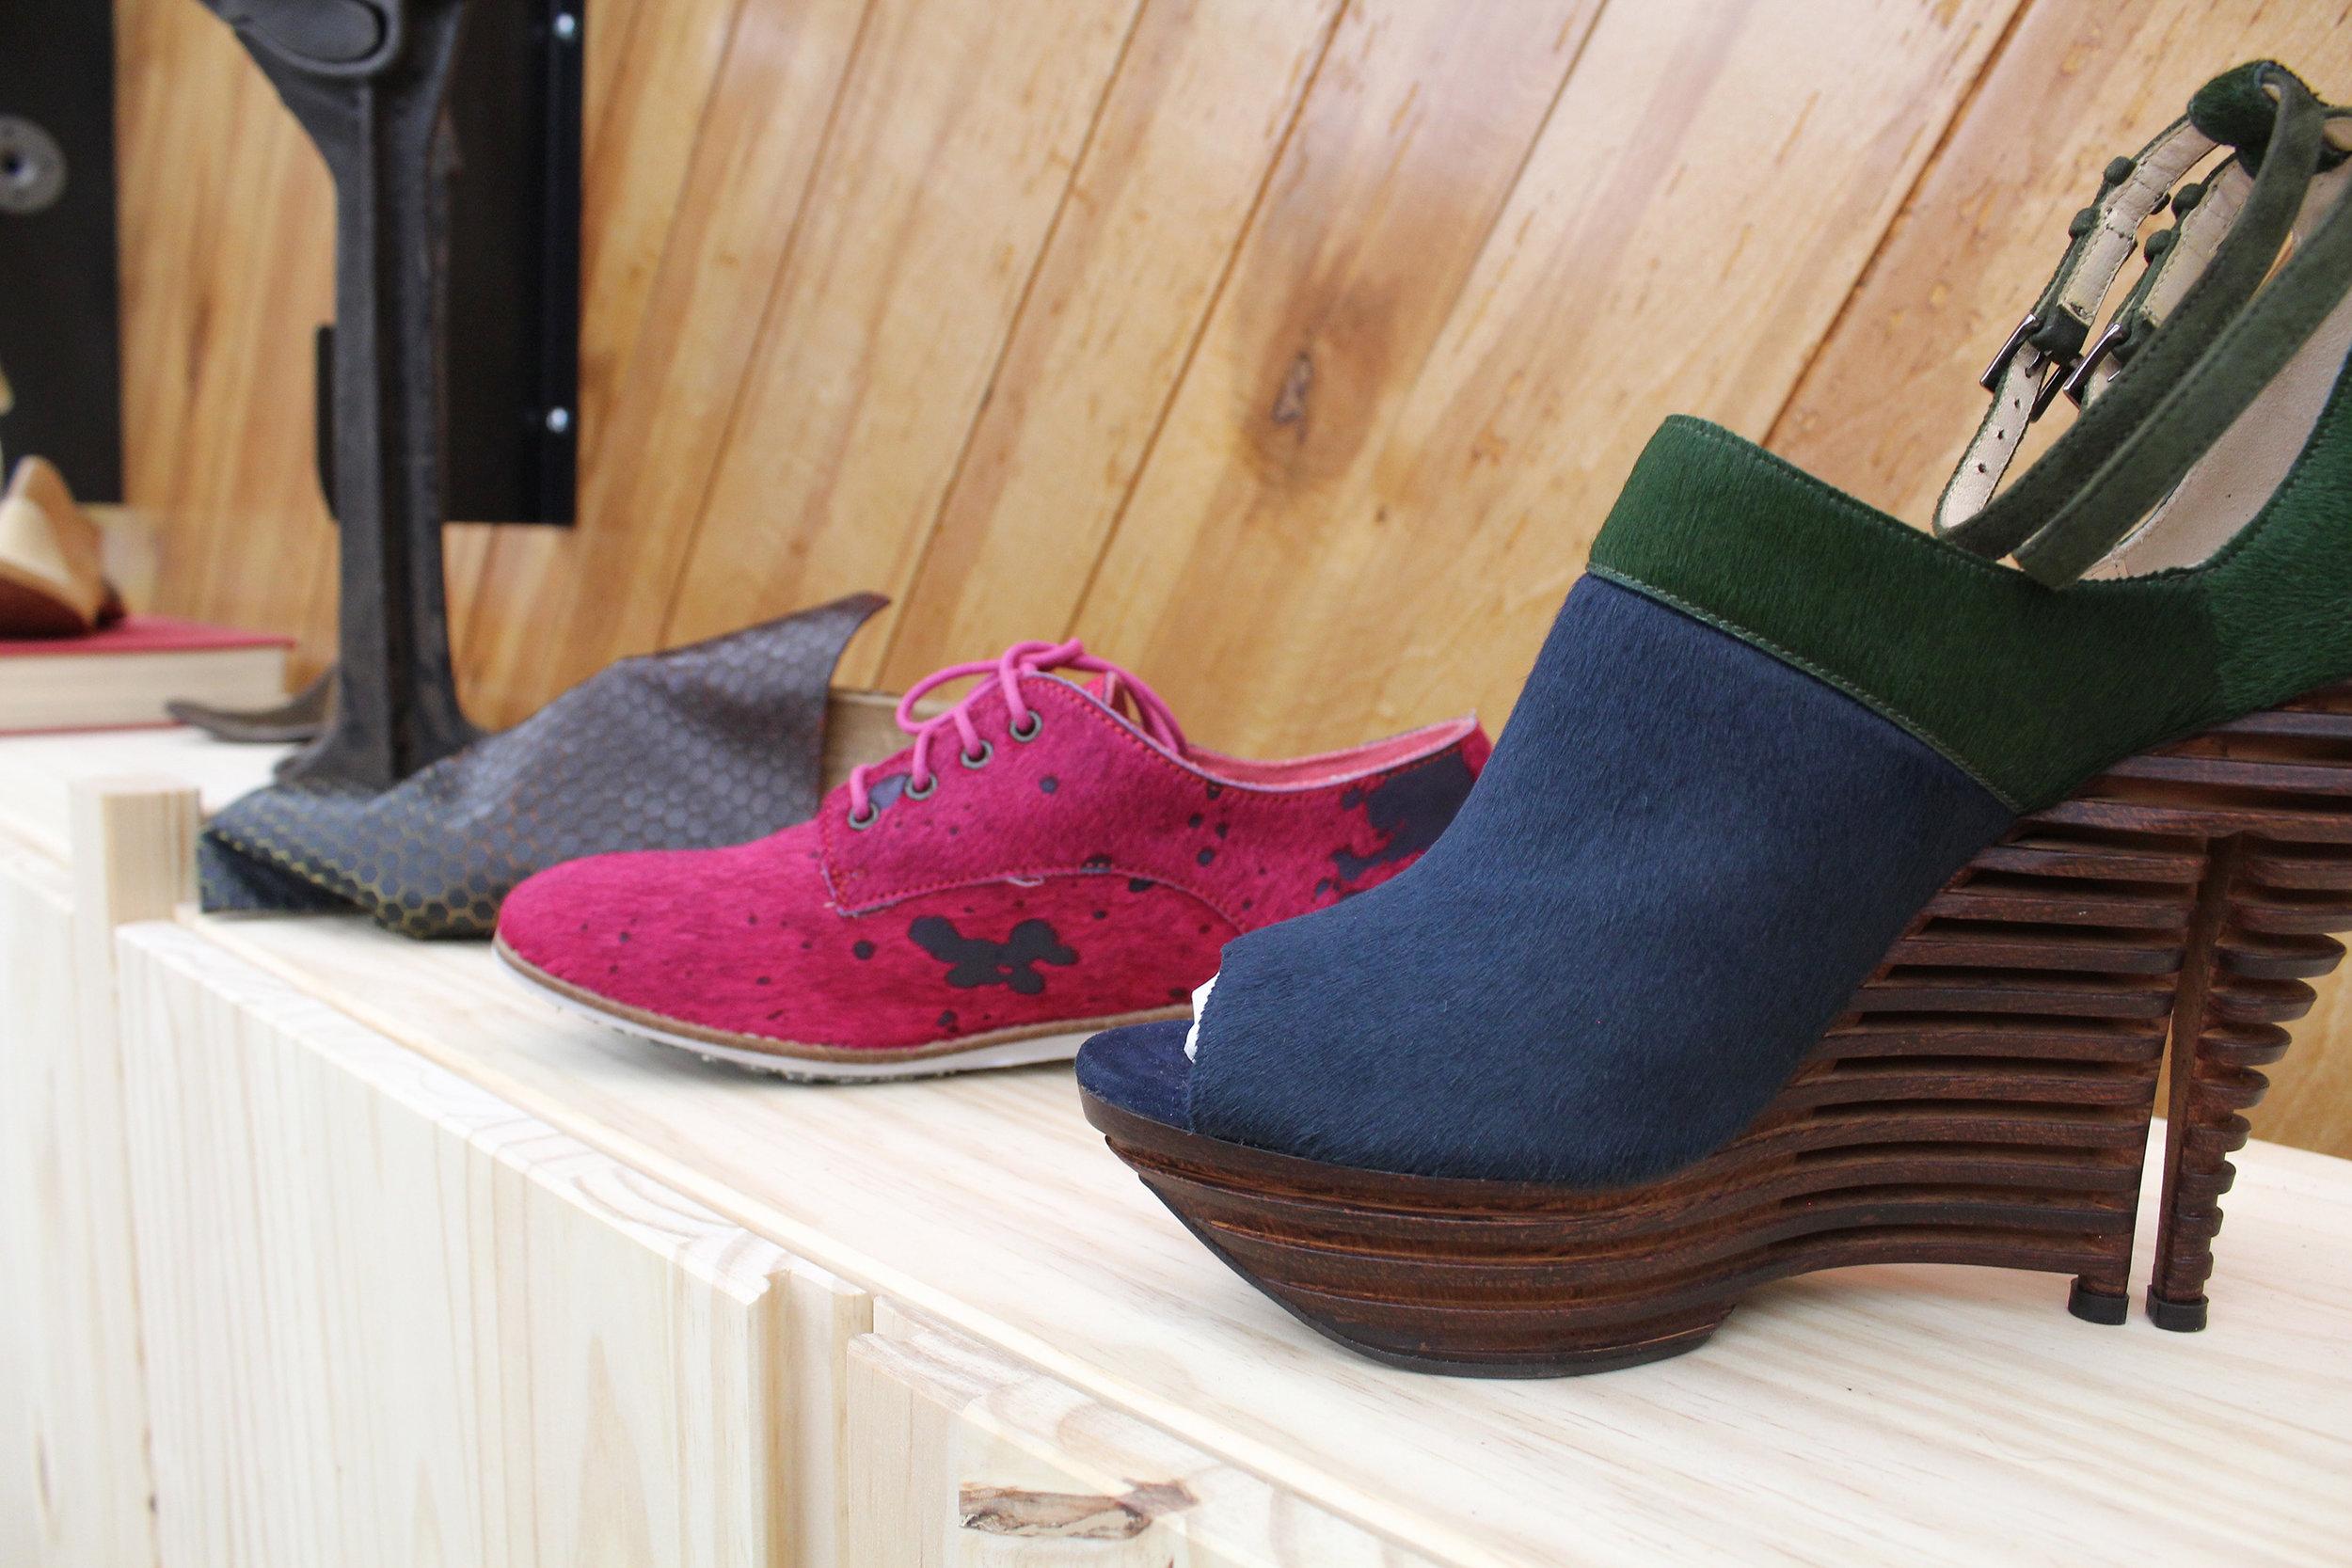 "Left to right-Suzette's leather design-HotShop 9,Vince Lebon 's Rollie Brand,Chris Dixon's Linda 1of 1  Below-Color tools Thank U Diva""L.C."",Textures, Schoeller Textiles, Clarino ""Ruffneck"" outdoor Microfiber"